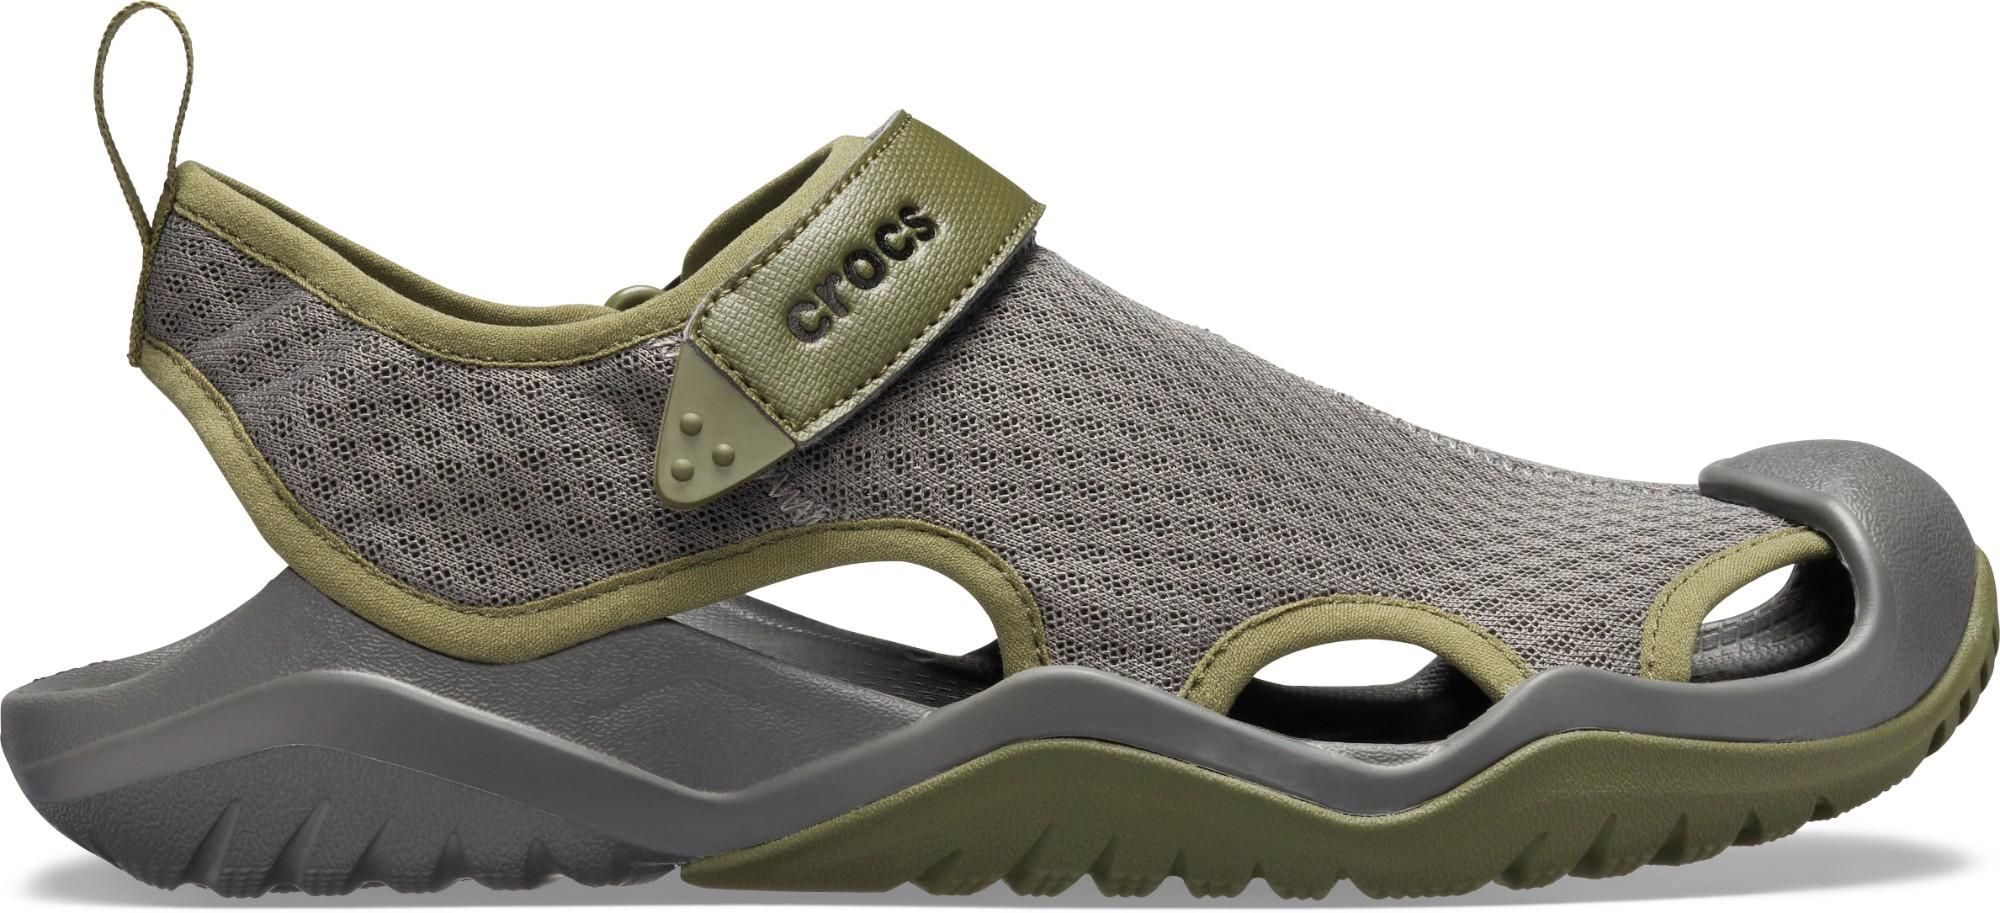 Crocs™ Swiftwater Mesh Deck Sandal Men's Slate Grey 41